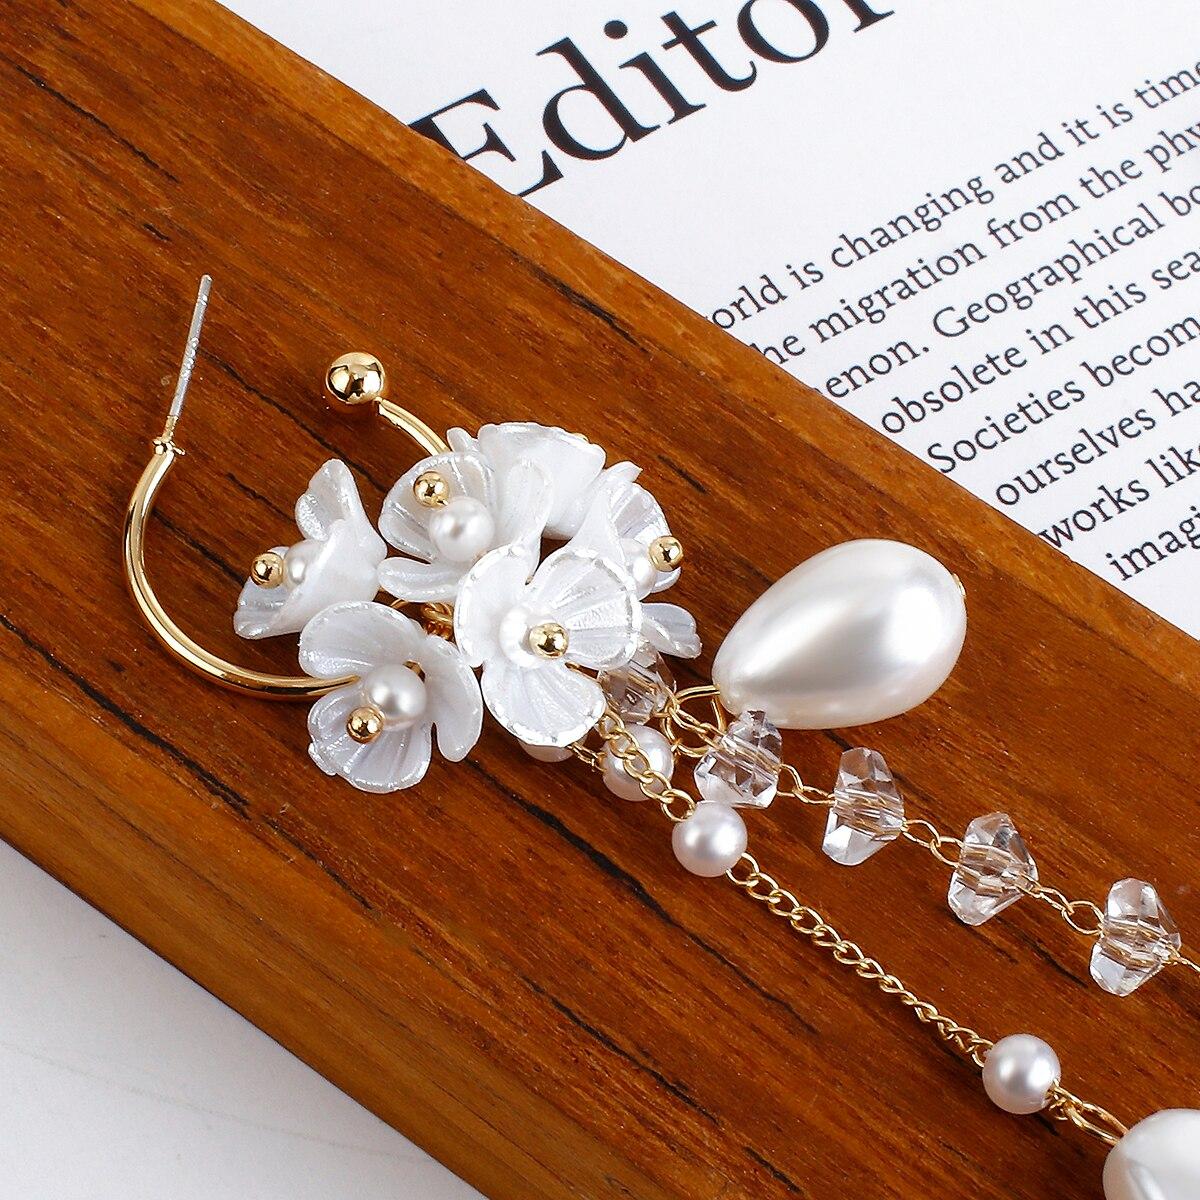 Lifefontier Fashion Long Tassel Simulated Pearl Drop Earrings Big Crystal Bead Resin Flower Petal Earrings for Women Wedding